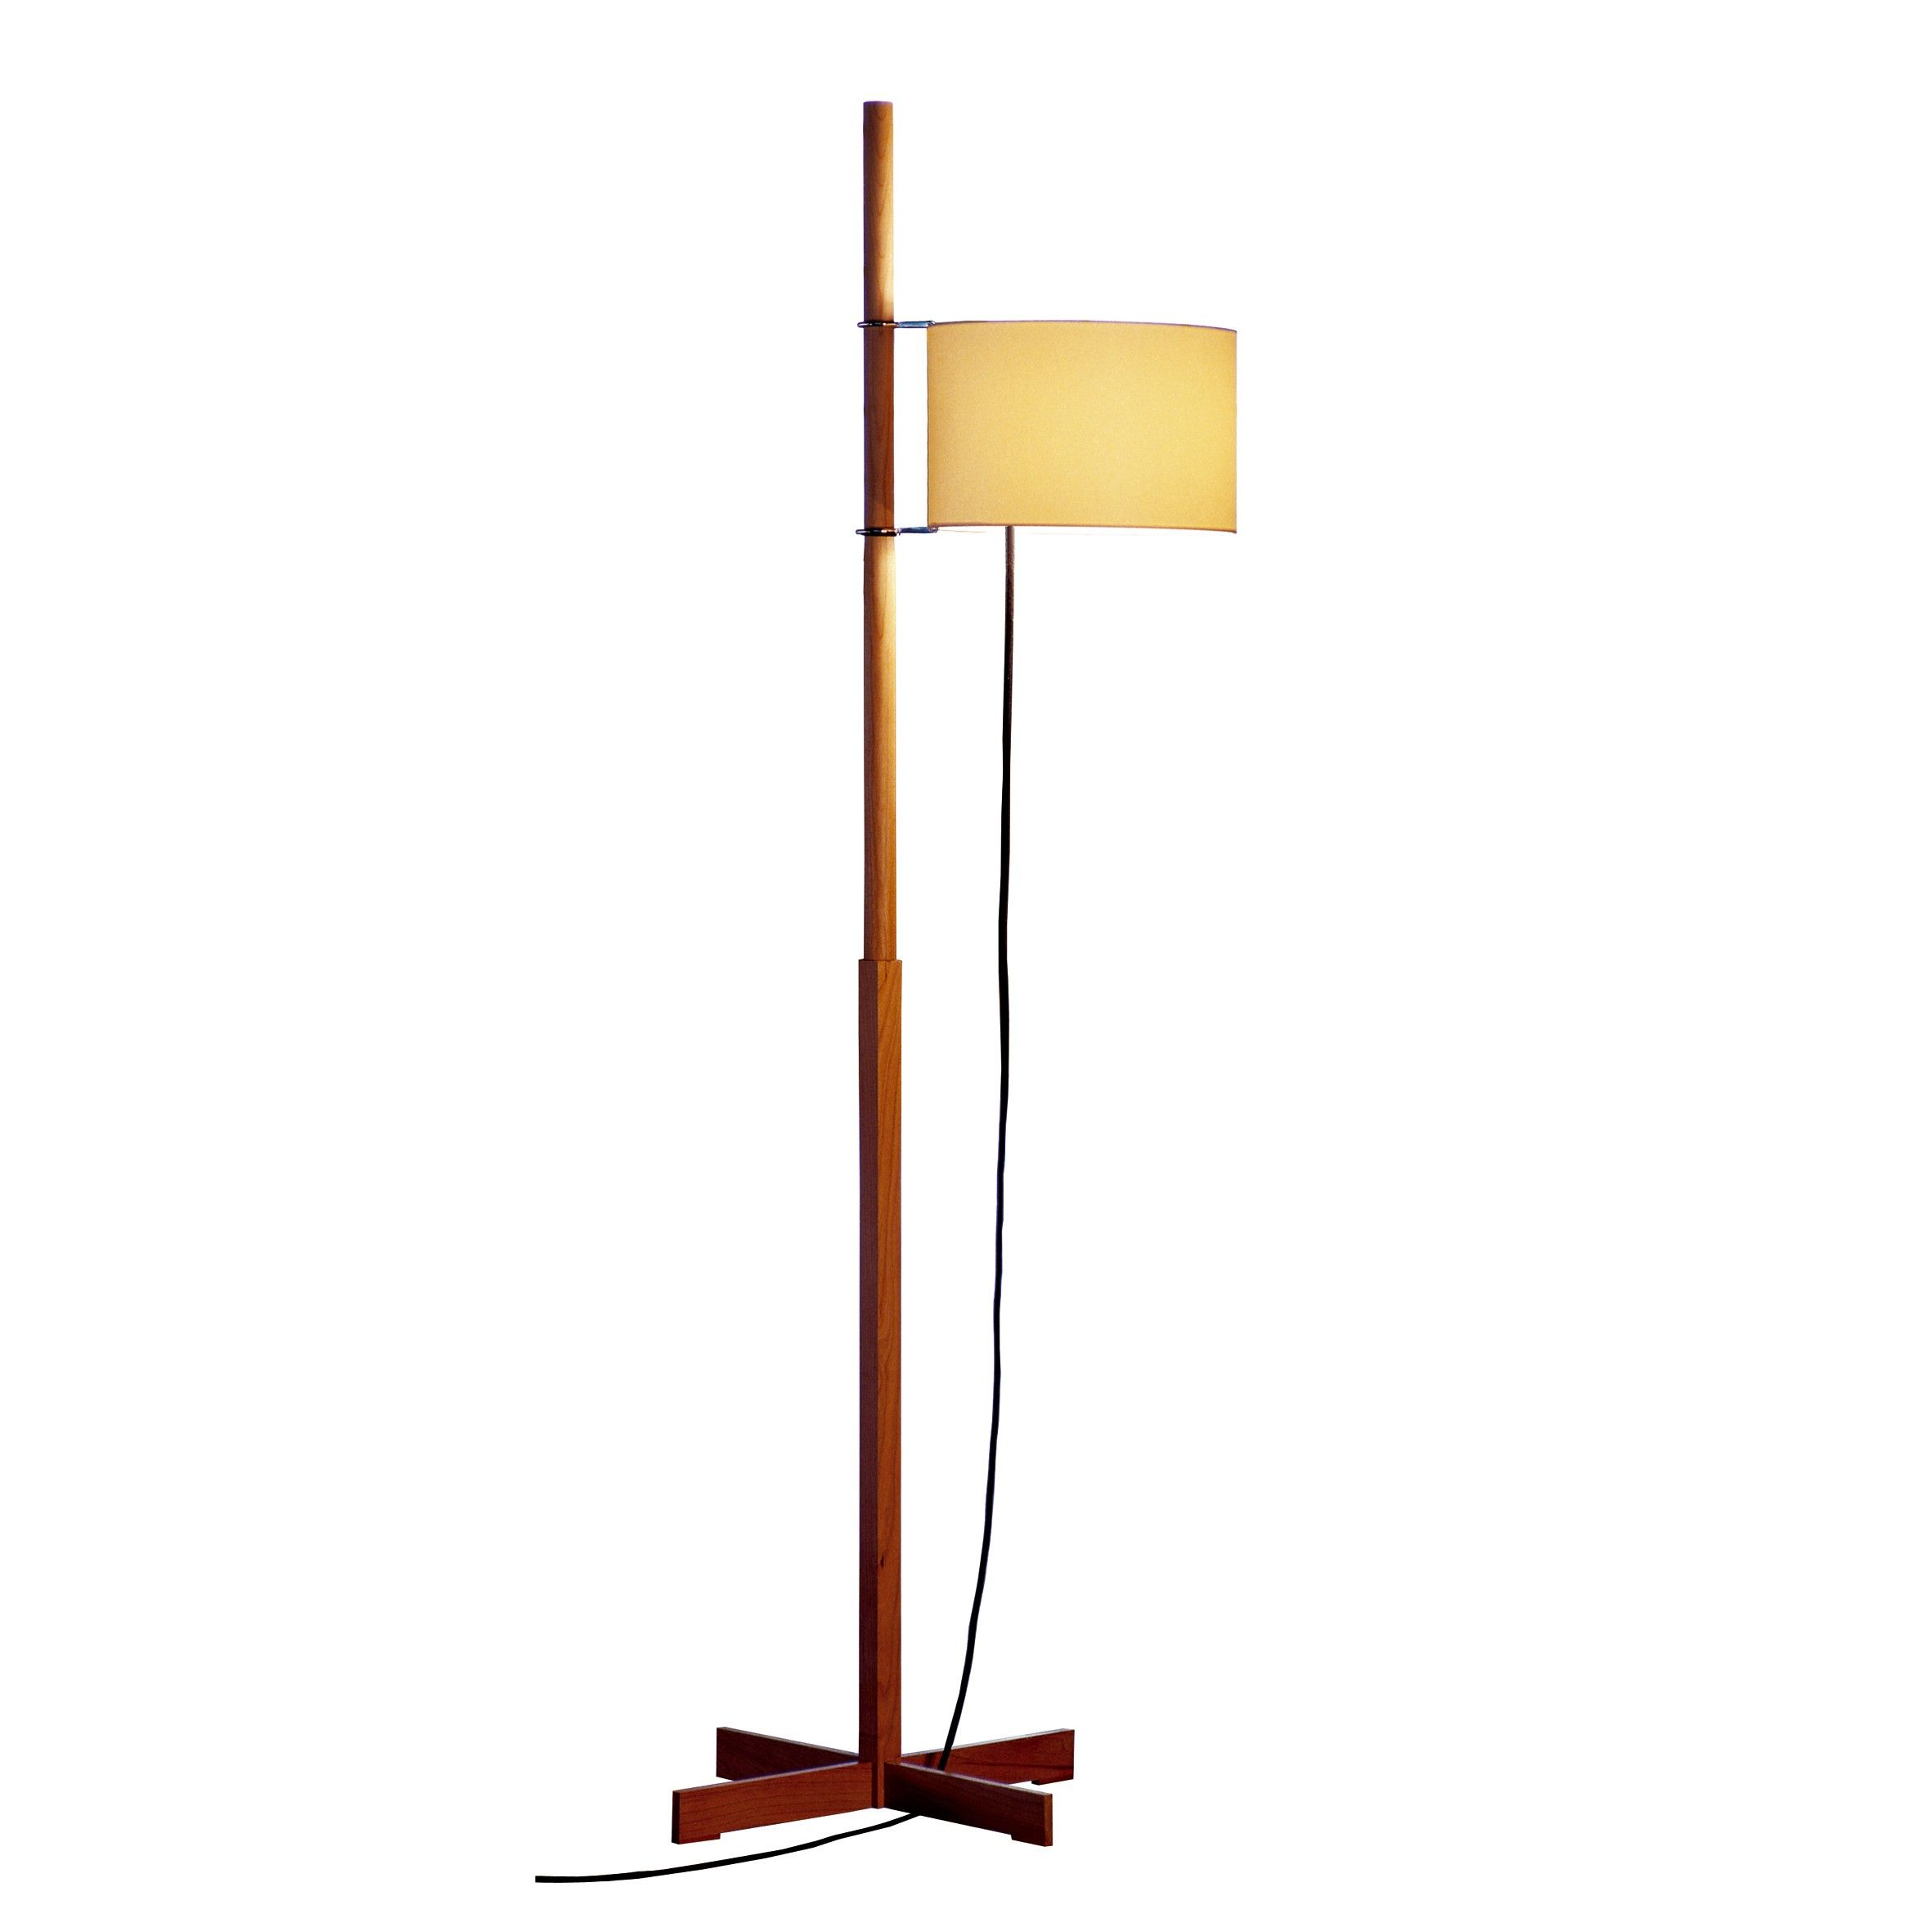 Lampara Tmm 1962 Floor Lamp Lamp Santa Cole Lamp